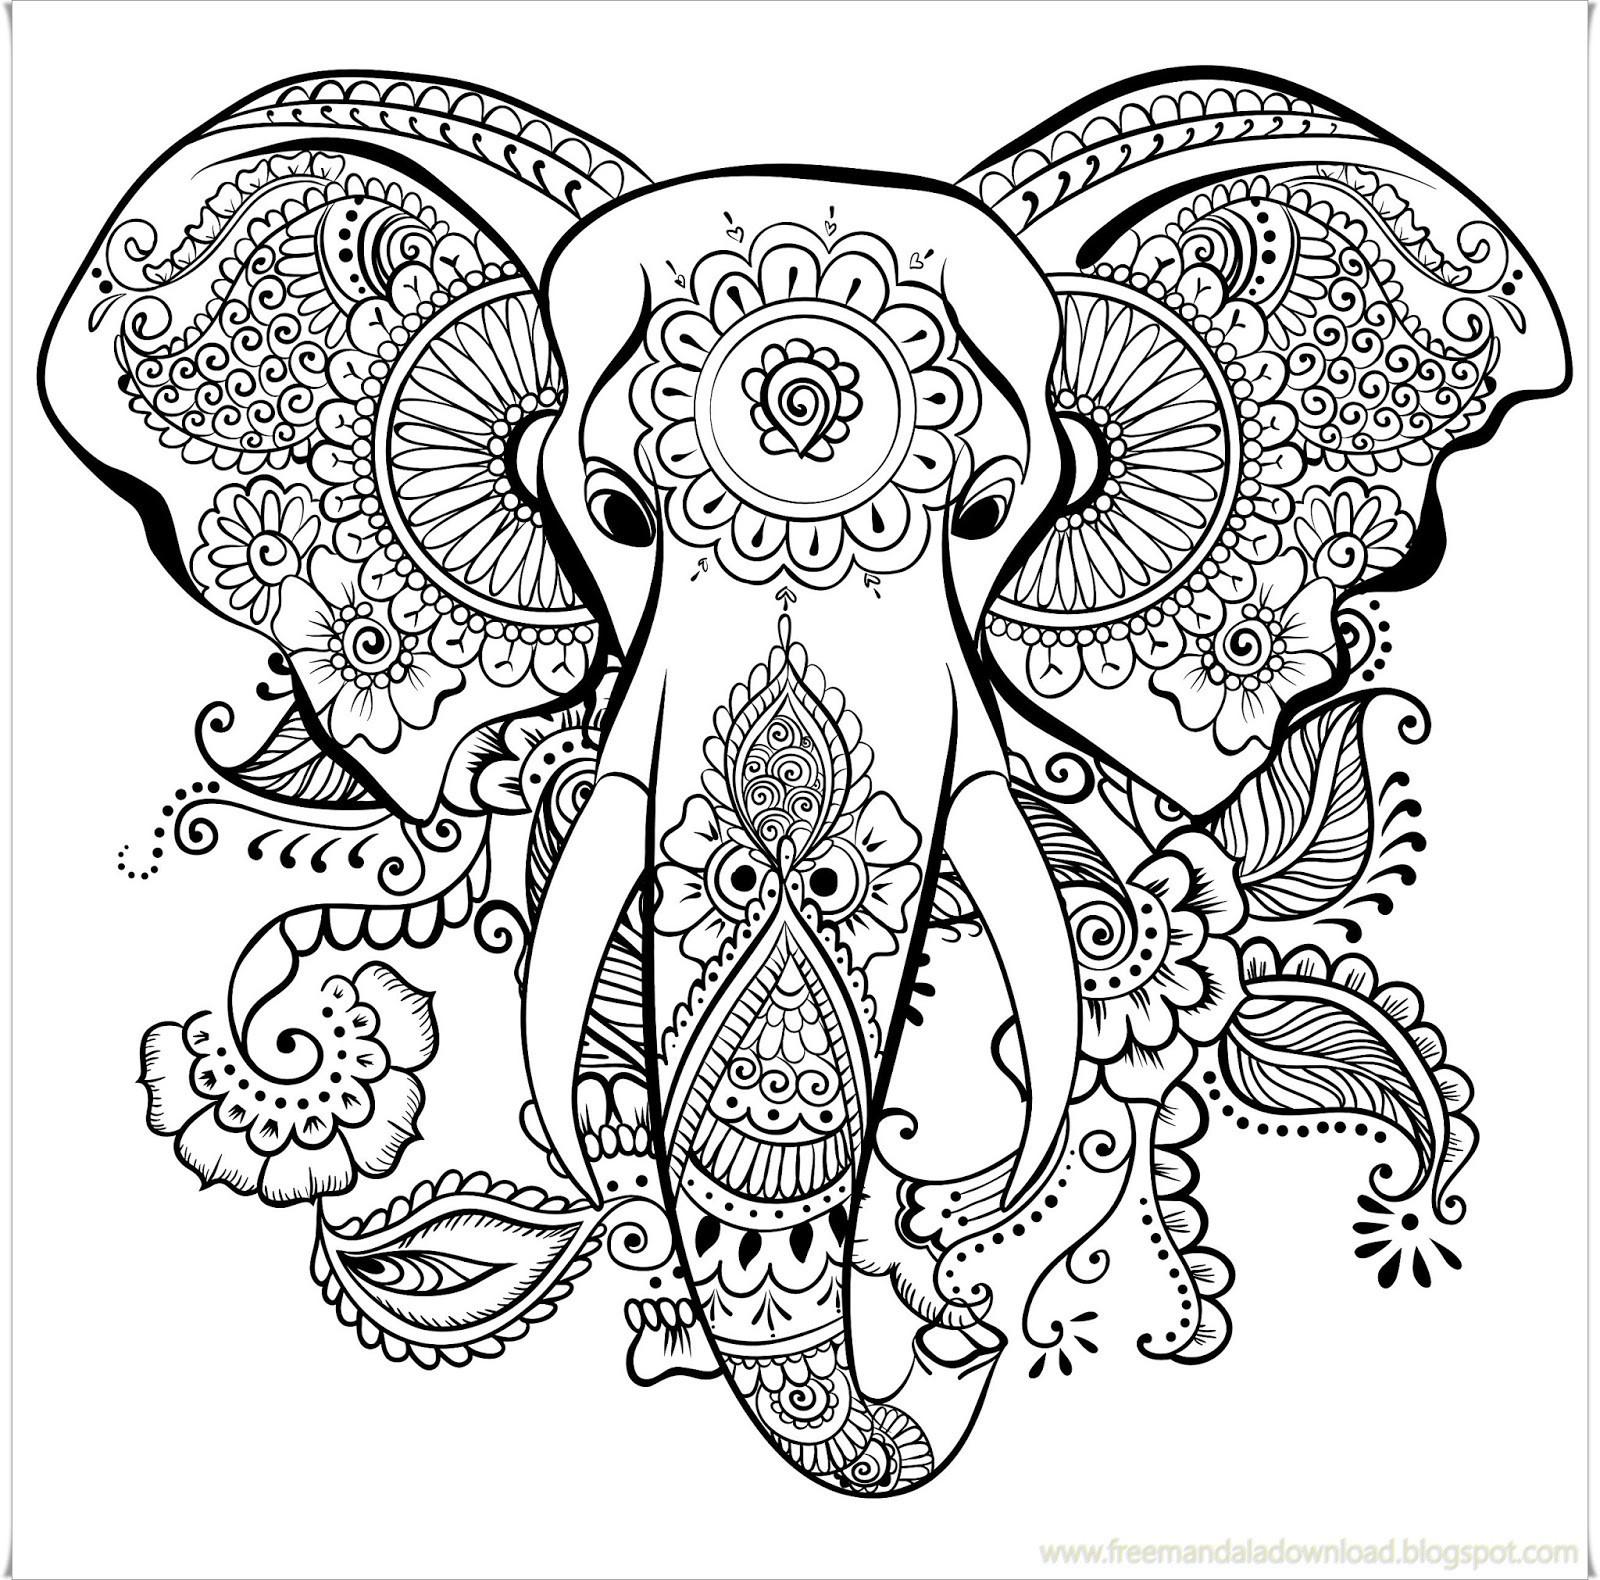 Ausmalbilder Fur Erwachsene Elefant Das Beste Von 100 Schöne Ausmalbilder Für Erwachsene Bilder Ideen Stock